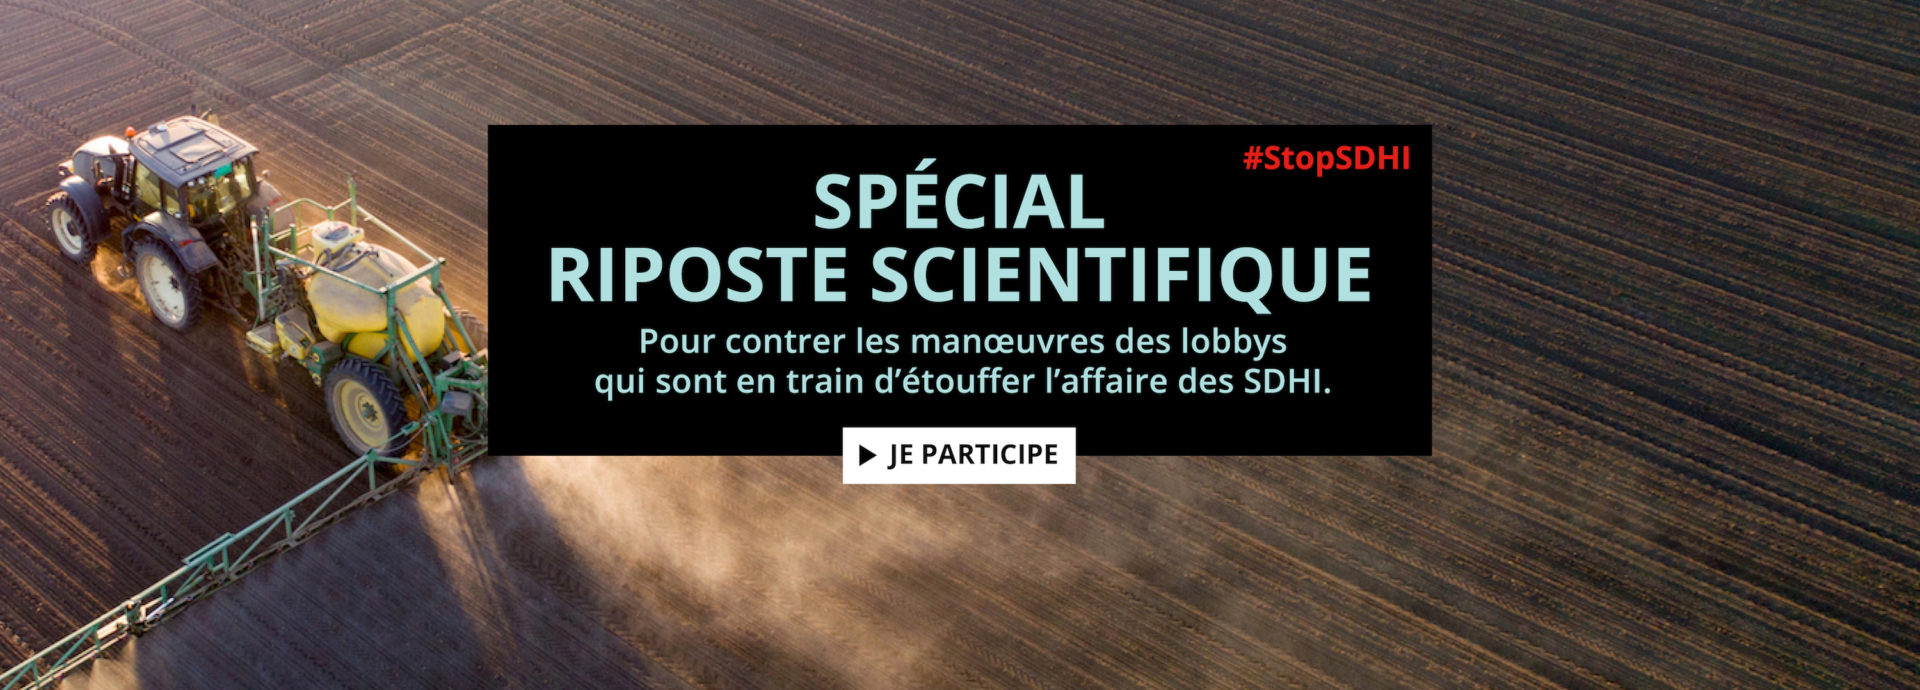 stop-sdhi-riposte-siteweb3